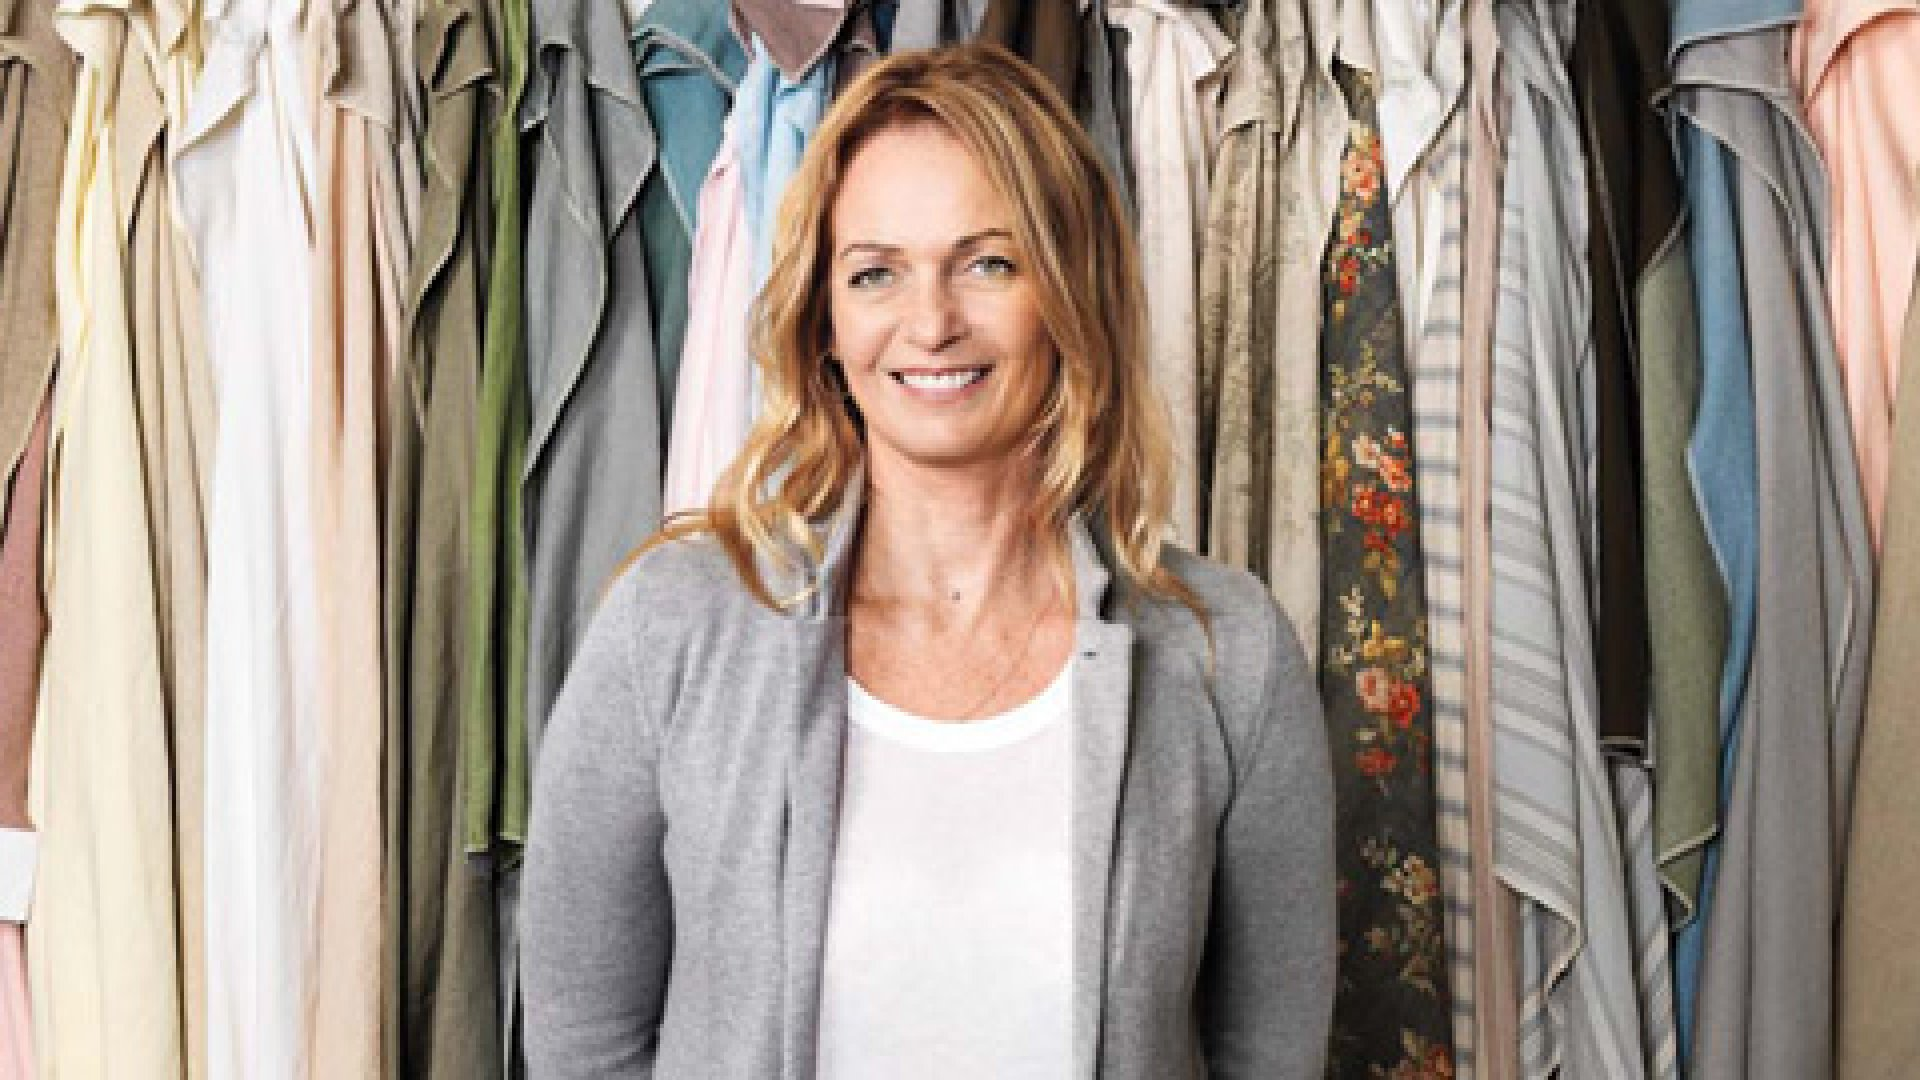 <b>Empire Rebuilding</b> Rachel Ashwell built a powerful retail brand. Then she lost it all.